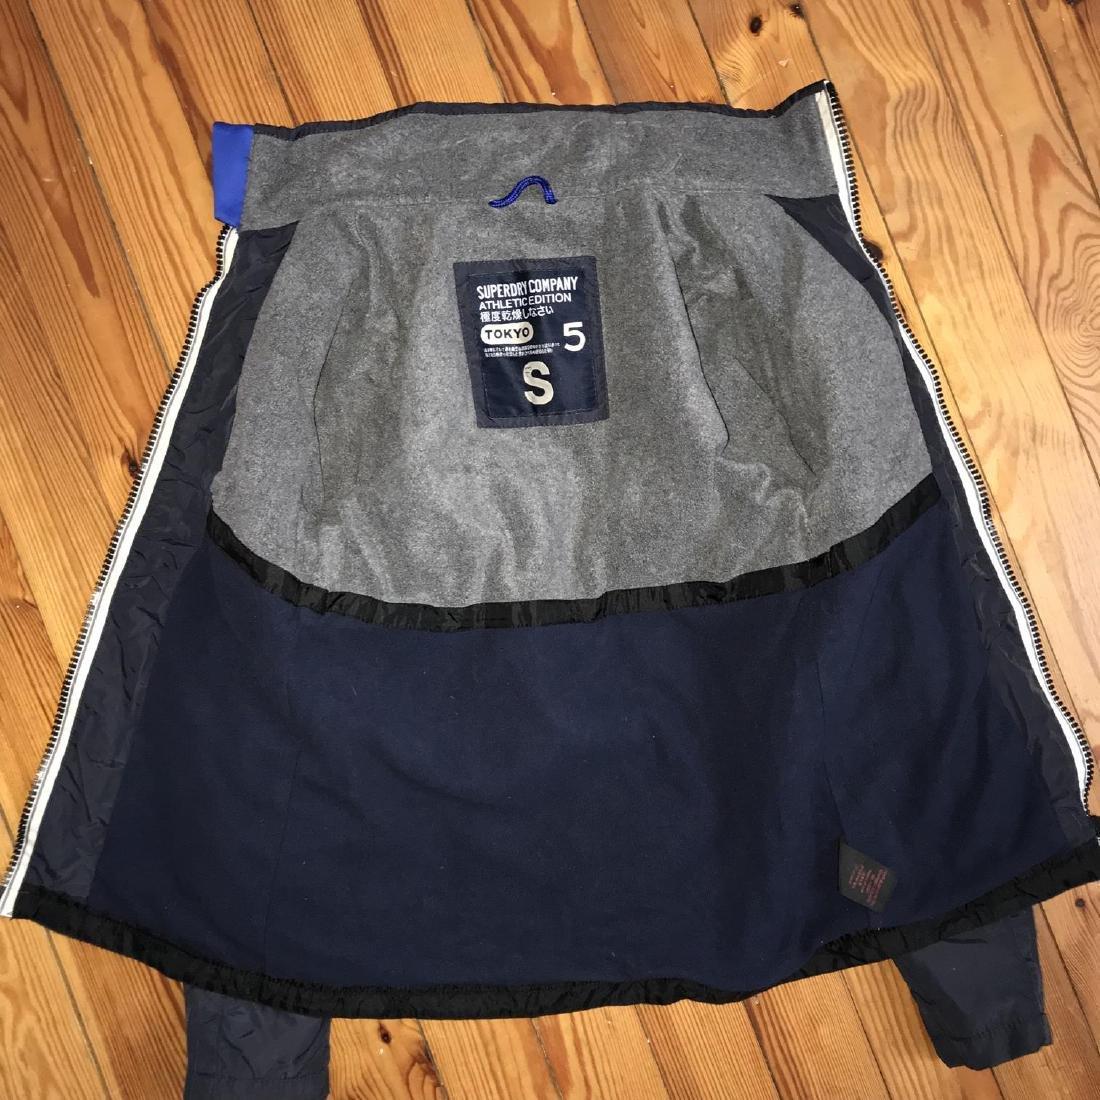 Men's Superdry TOKYO 5 Navy Blue Jacket Size S Perfect! - 2